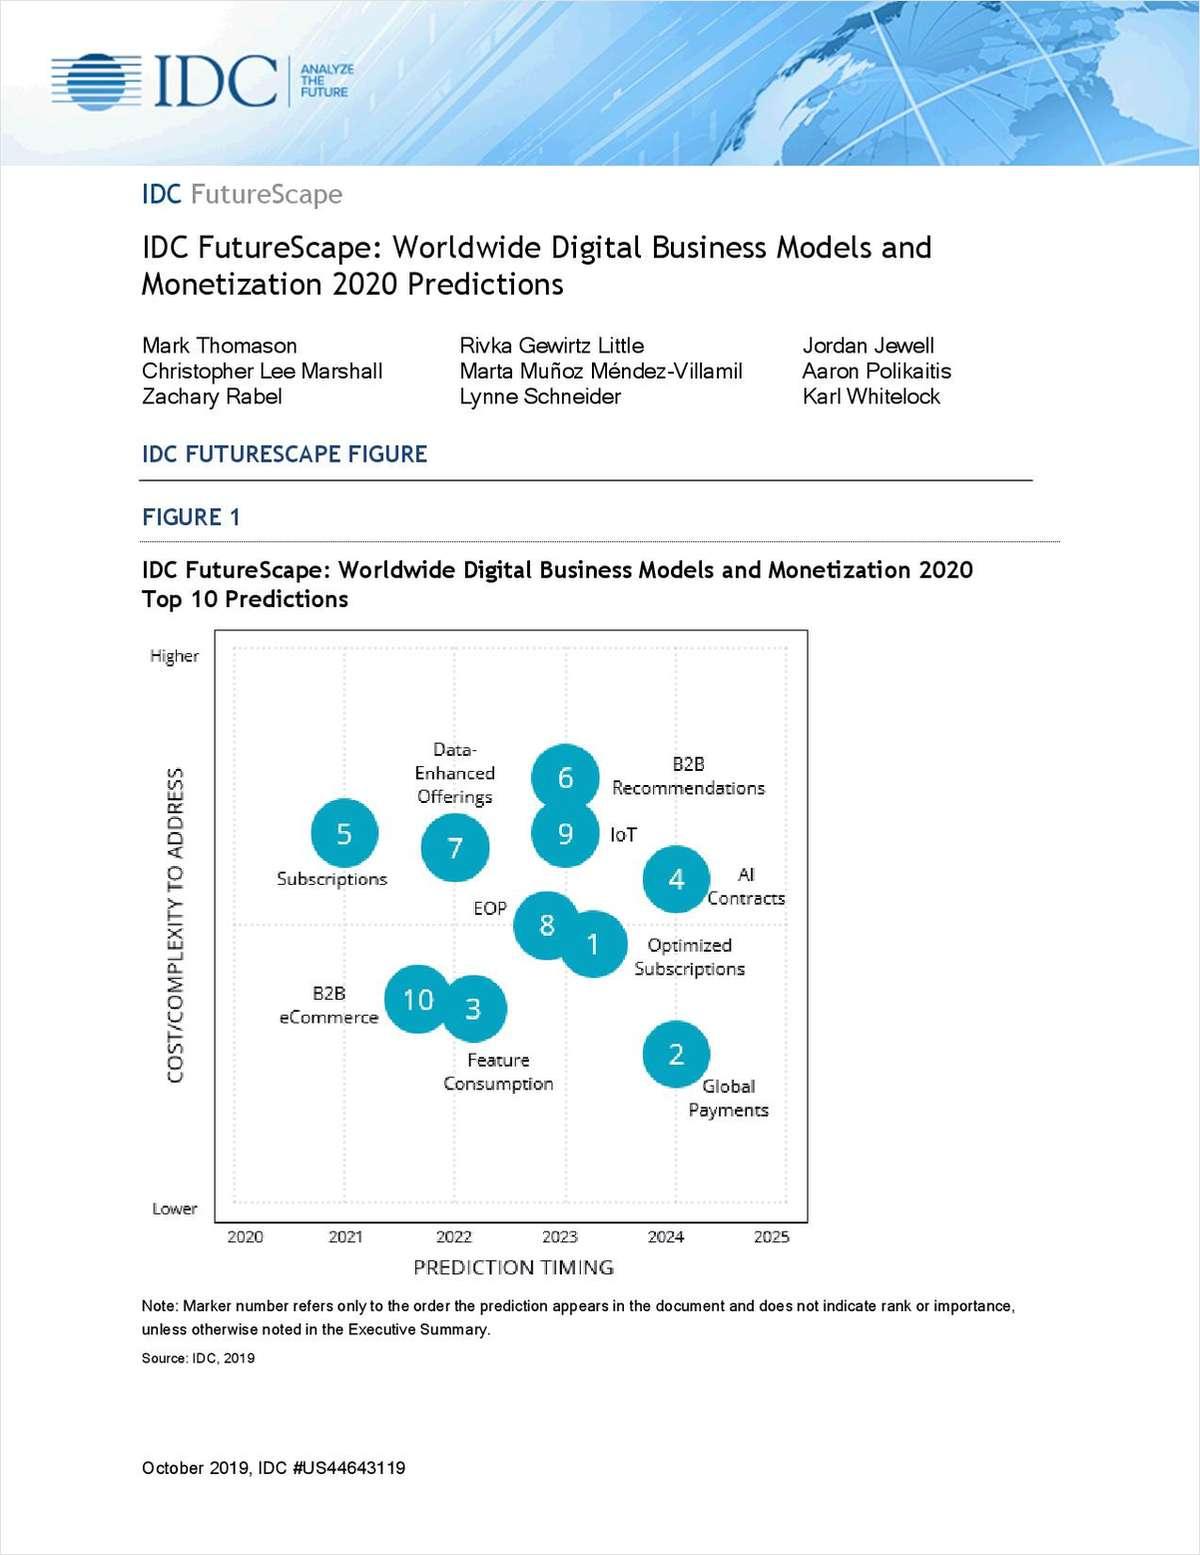 IDC Worldwide Digital Business Models and Monetization 2020 Predictions